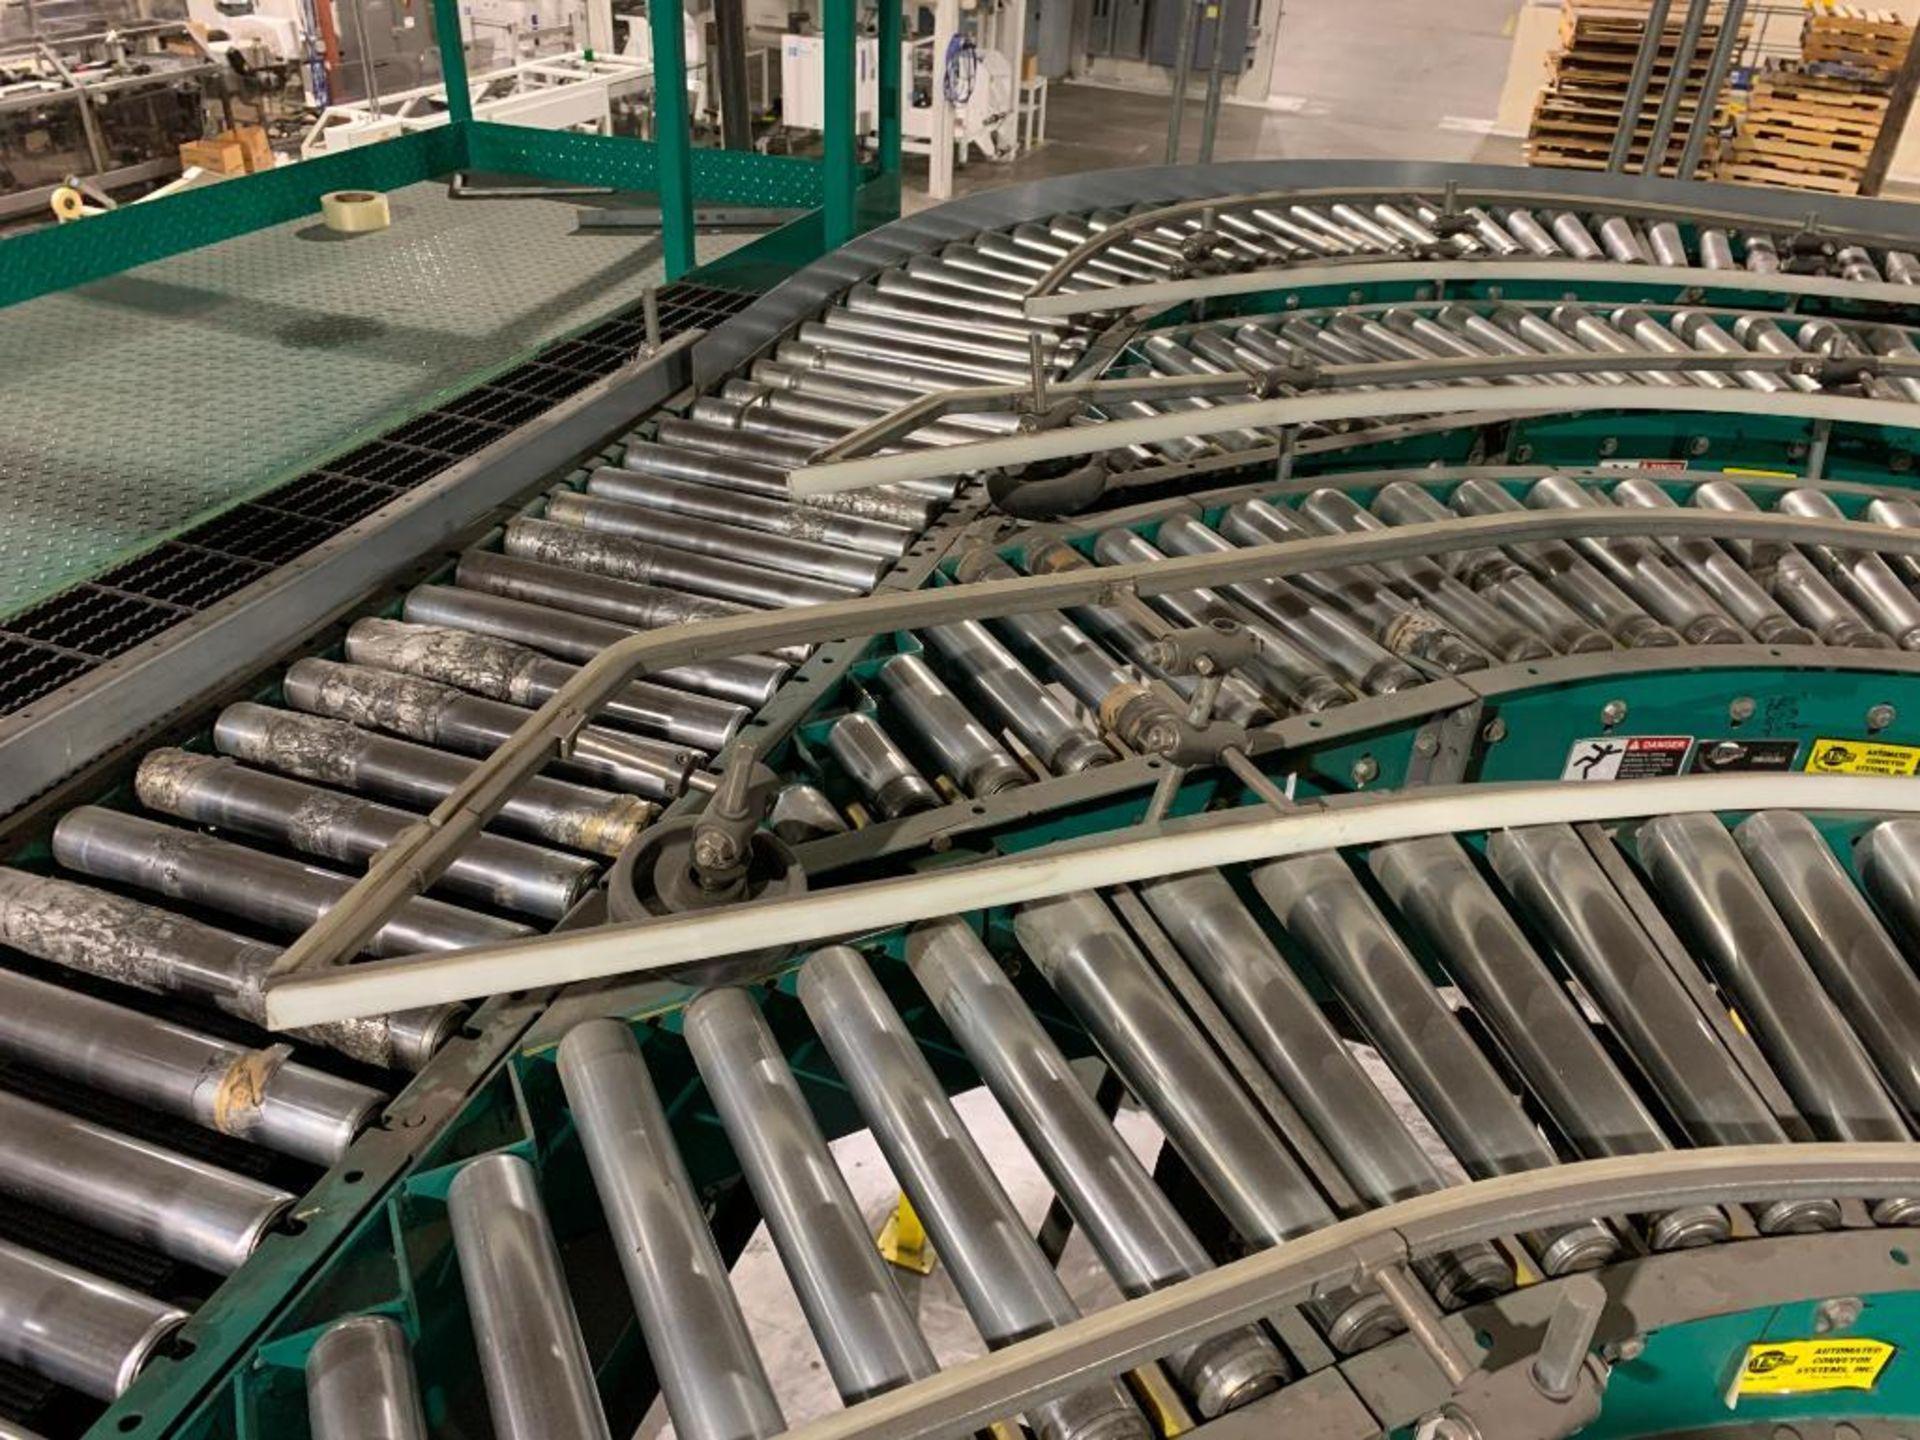 ACS power roller conveyor - Image 3 of 15